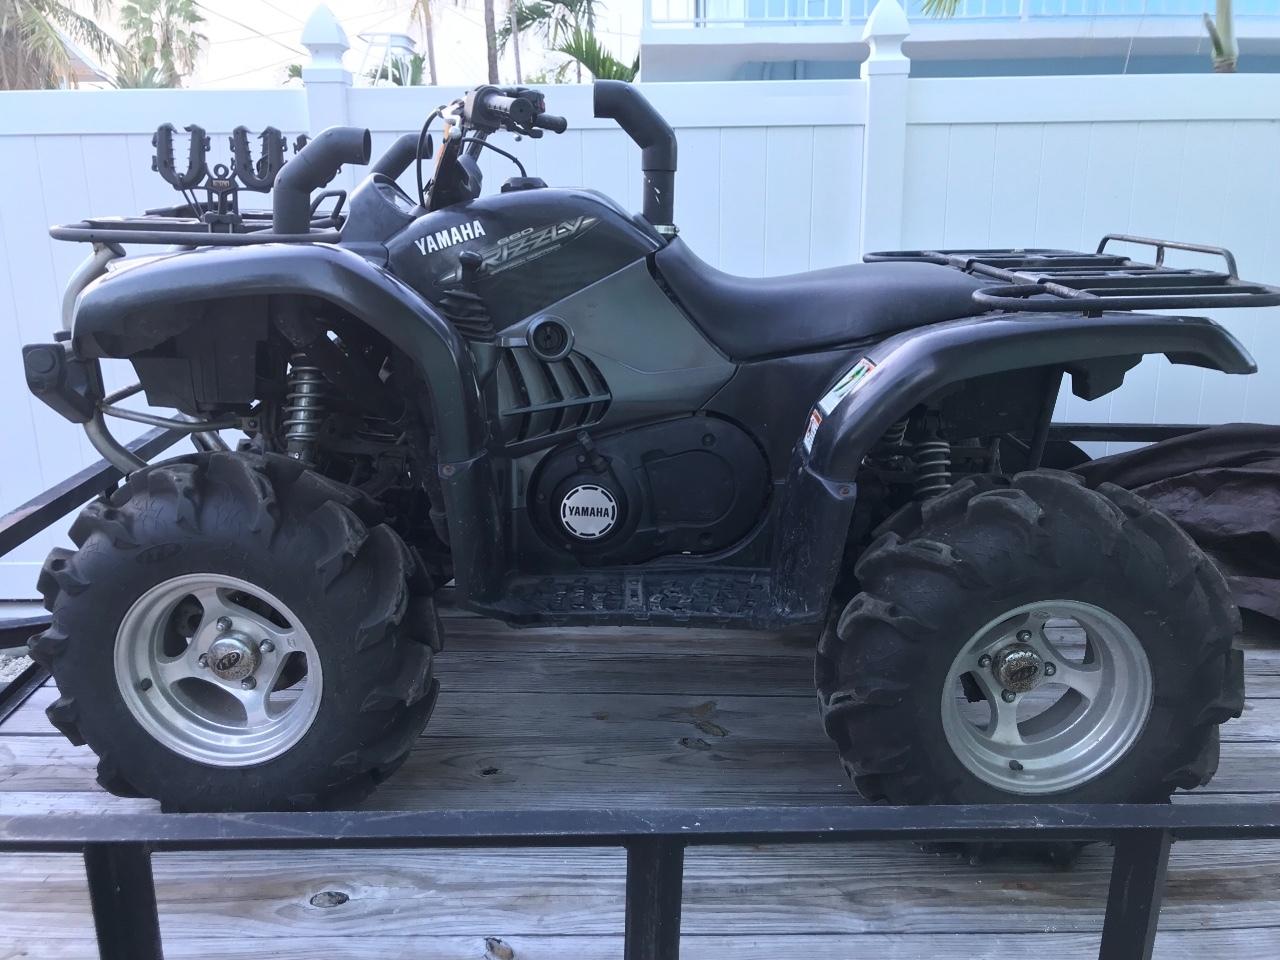 Yamaha For Sale - Yamaha Four Wheeler ATVs - ATV Trader